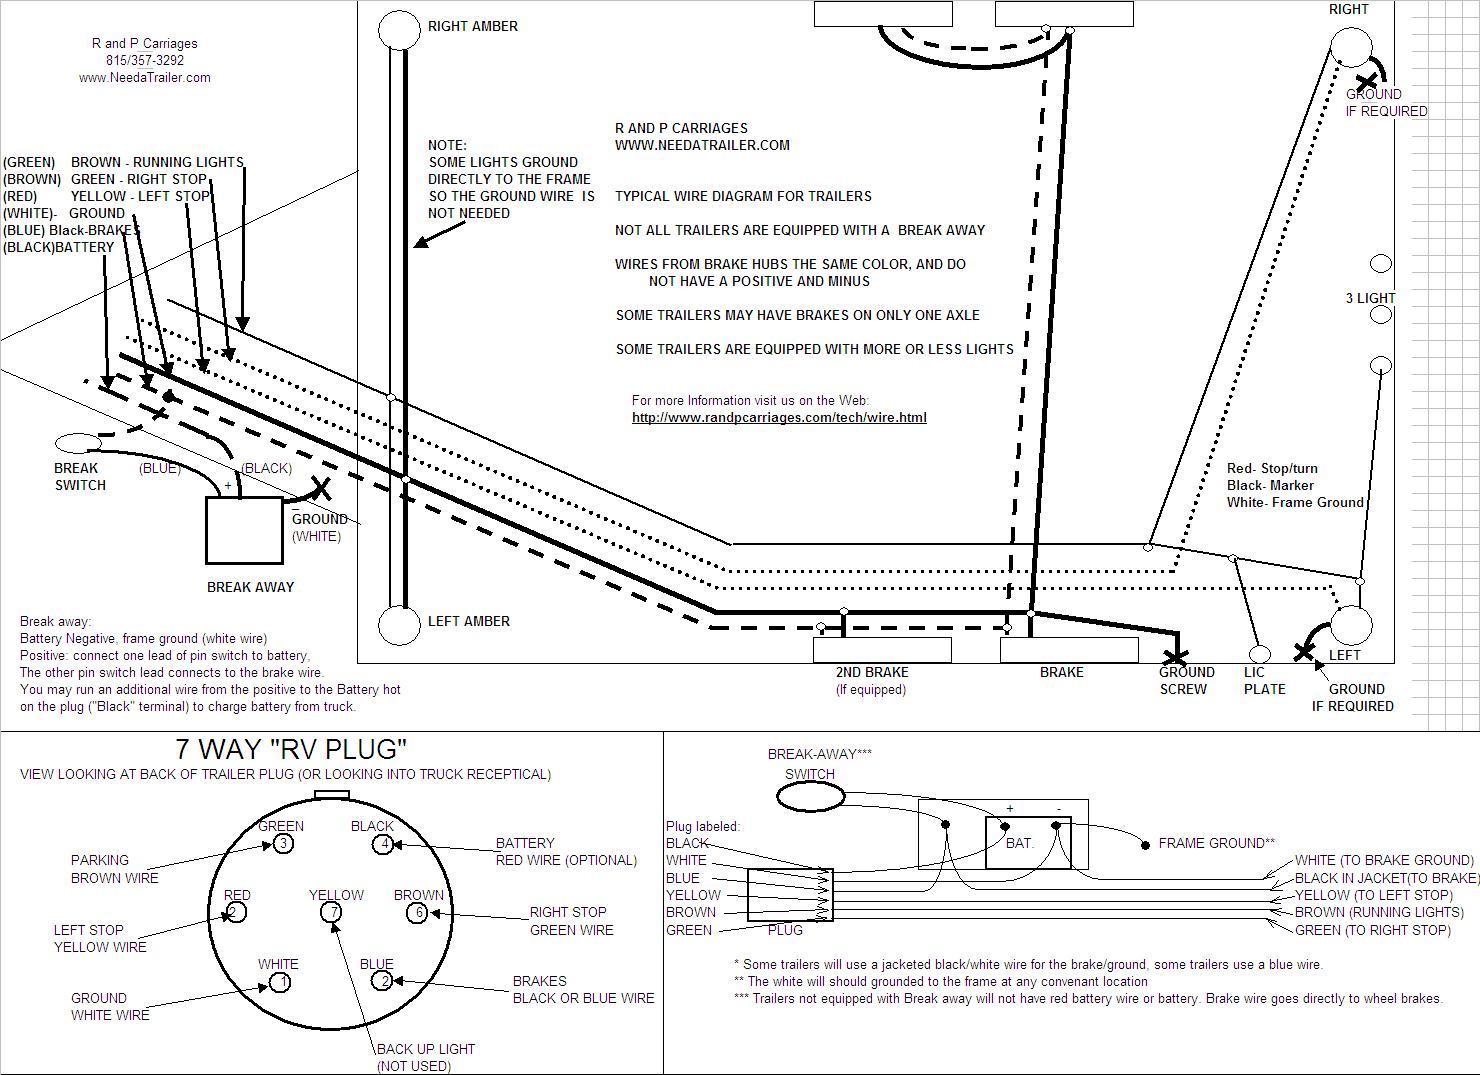 Horse Trailer Electric Brakes Wiring Diagram